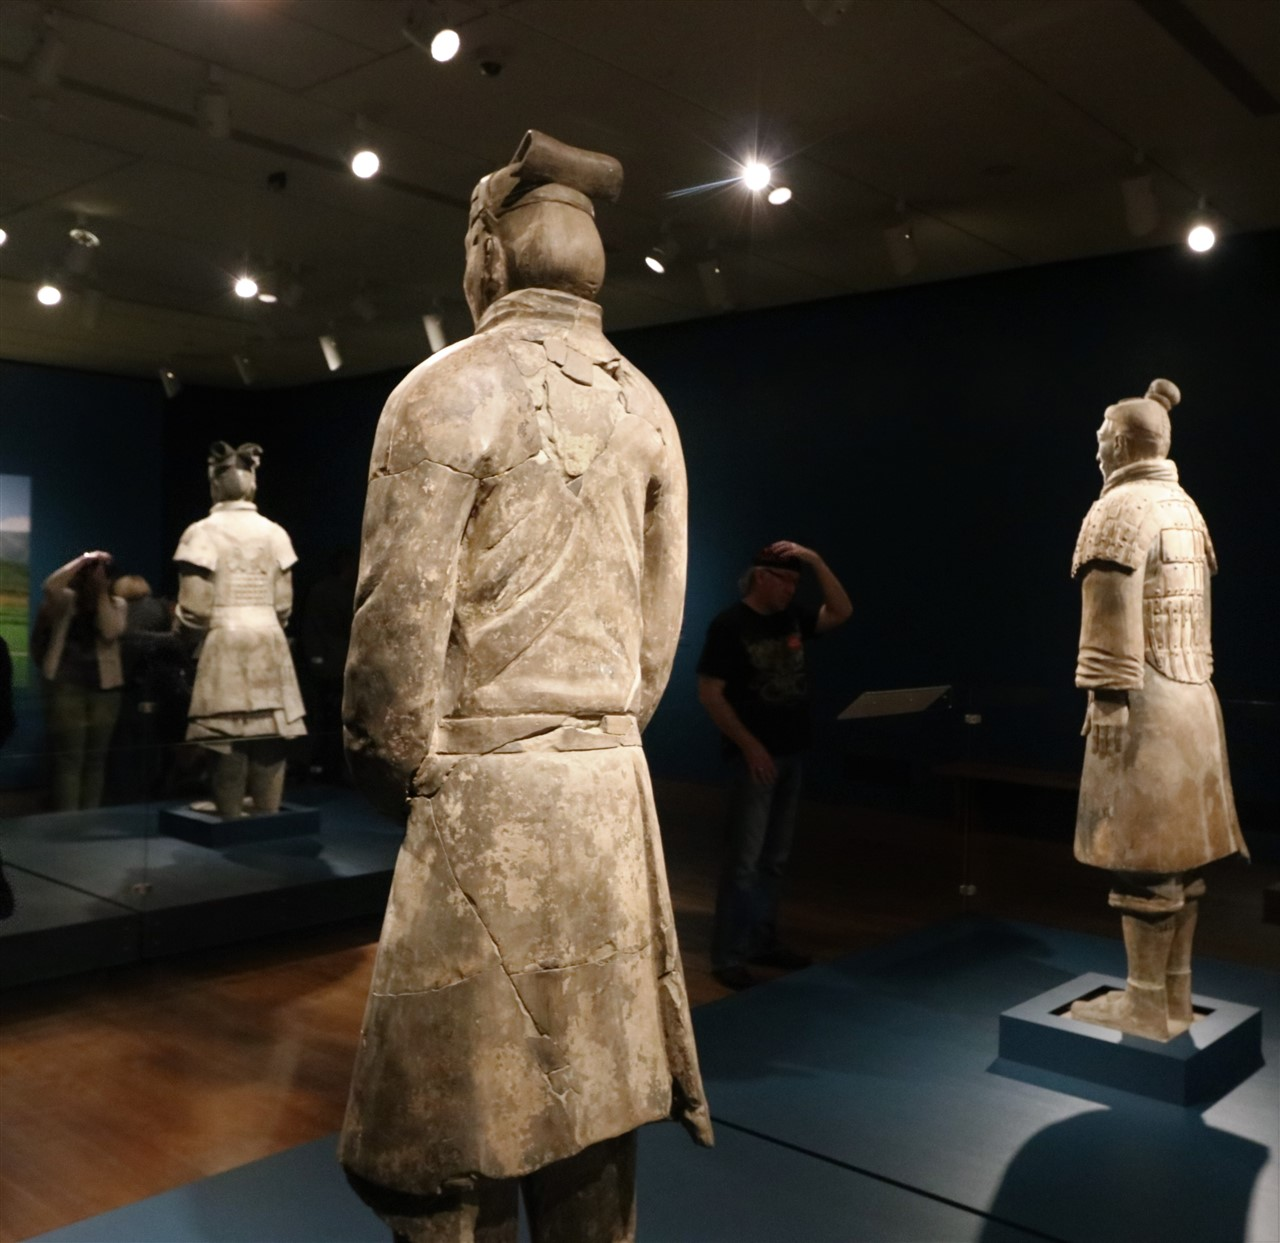 2018 04 21 119 Cincinnati Art Museum.jpg